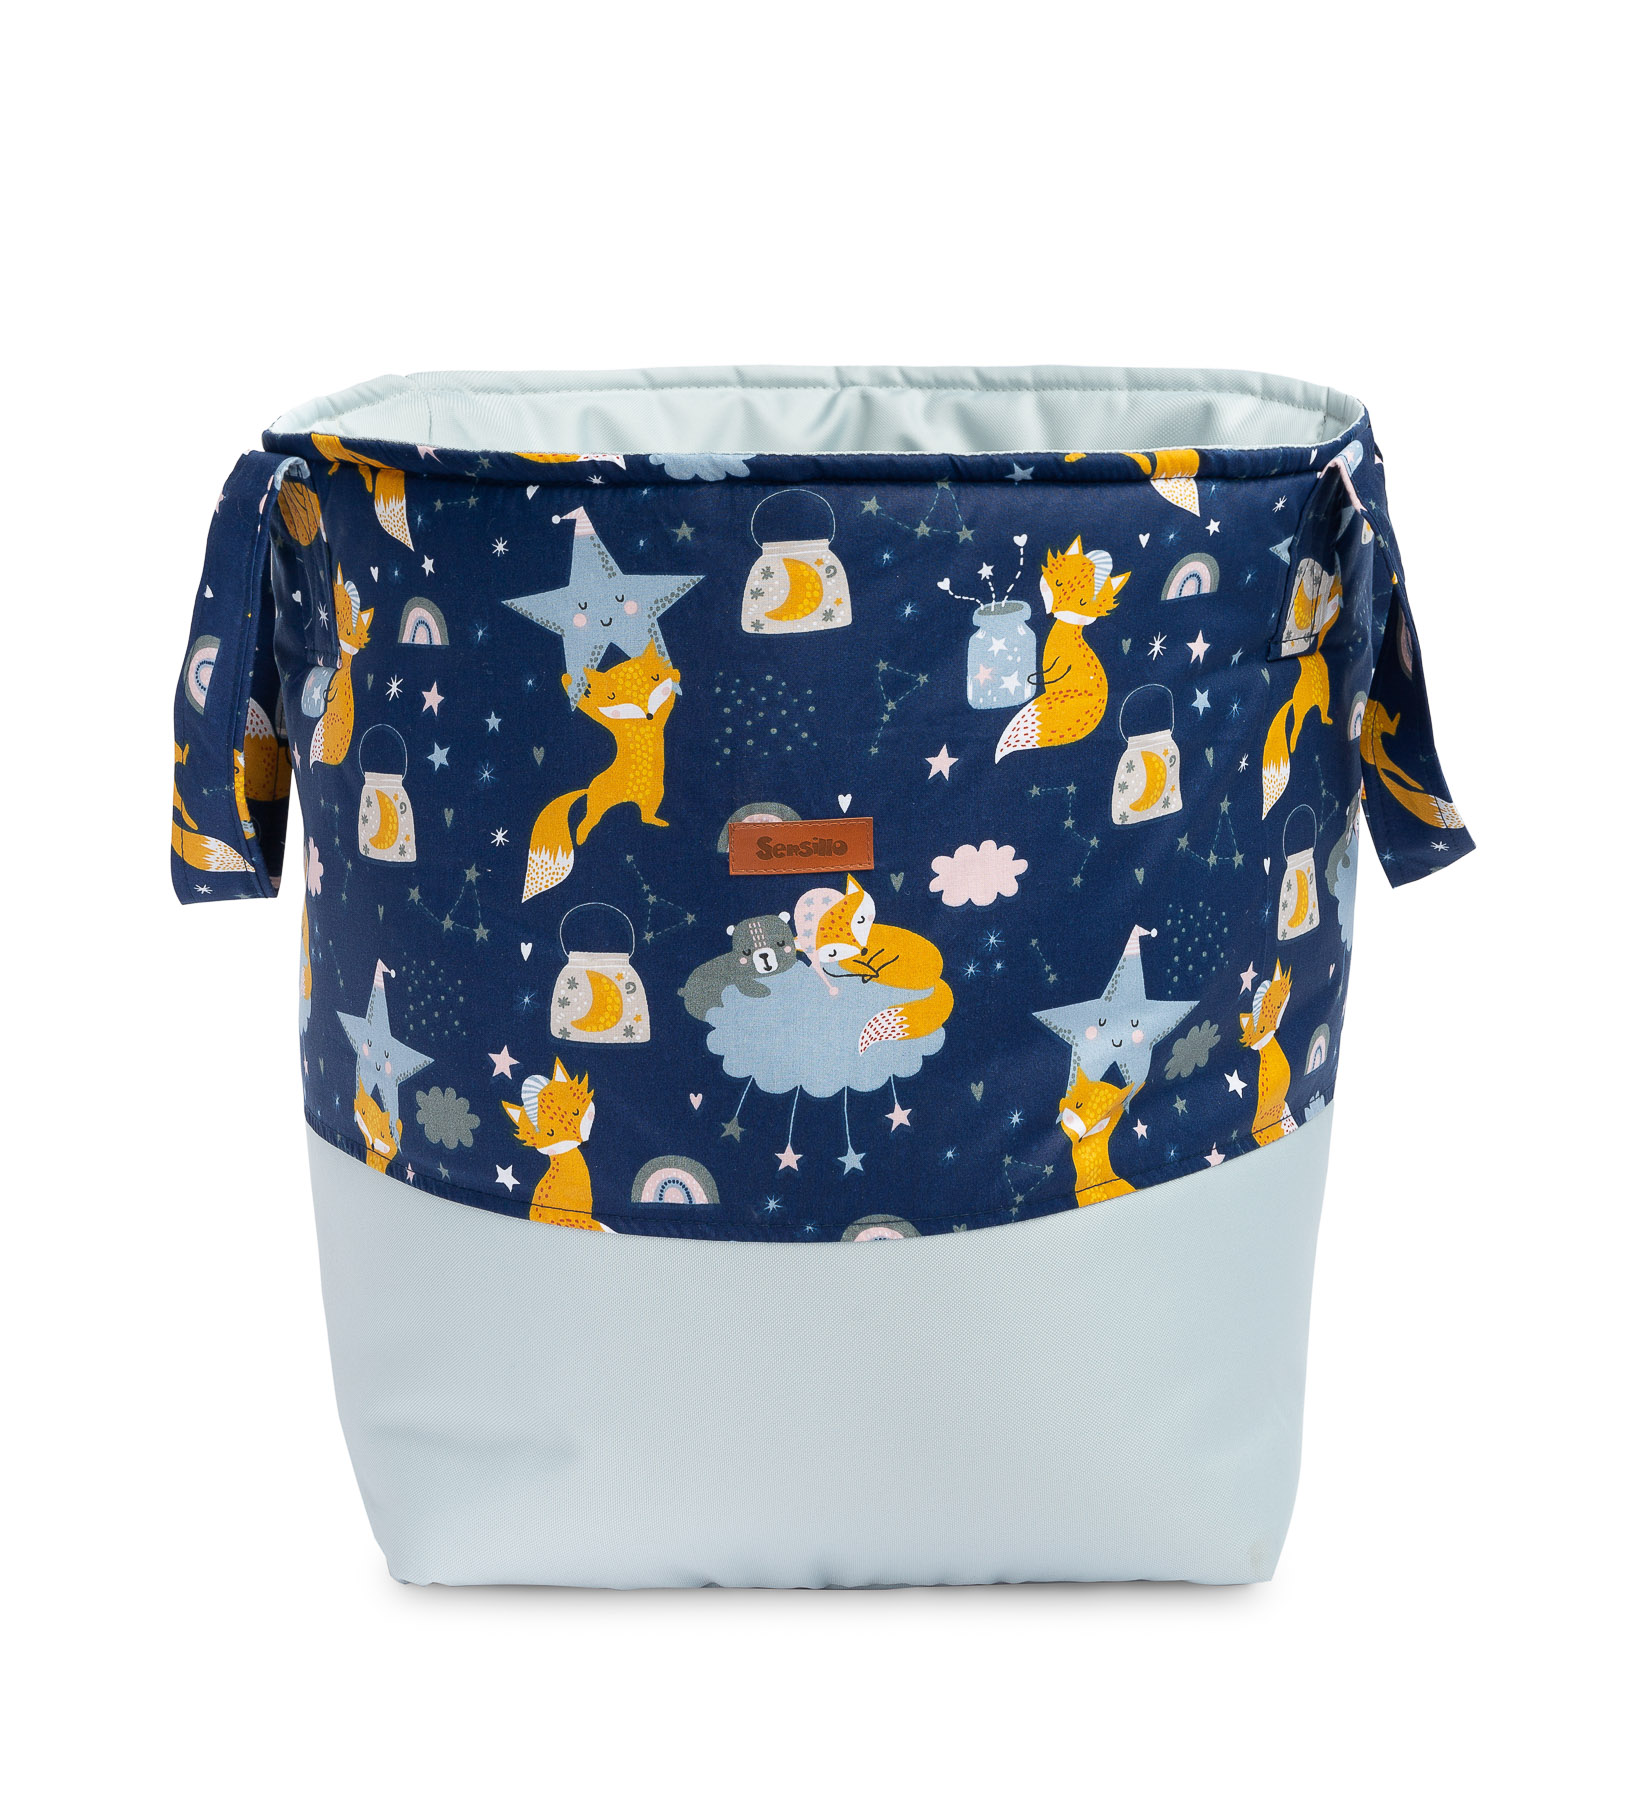 Basket for toys Medium – foxes navy blue